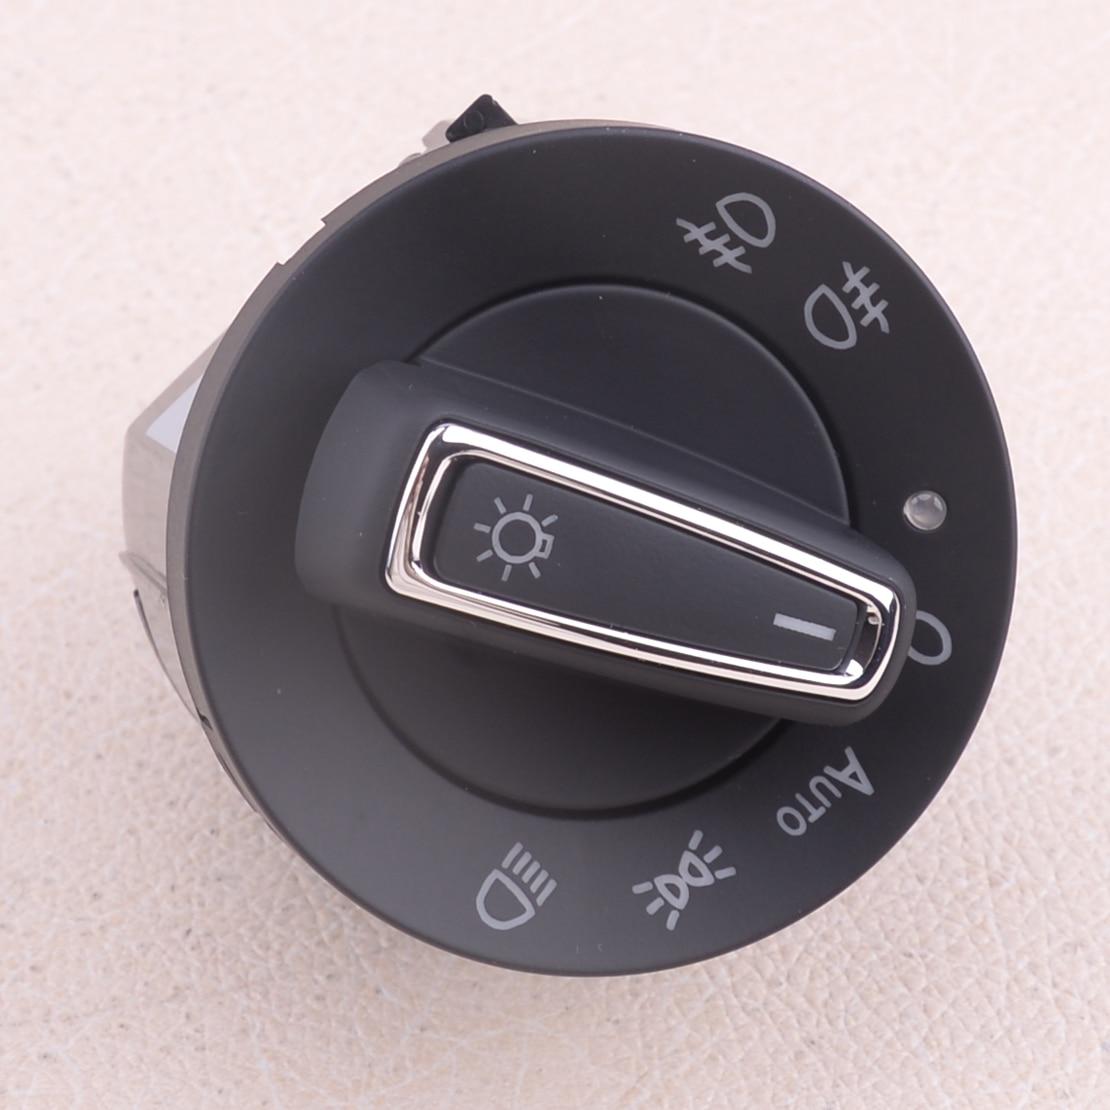 Citall módulo de controle interruptor do farol automático apto para vw golf jetta tiguan touran passat scirocco 5nd941431